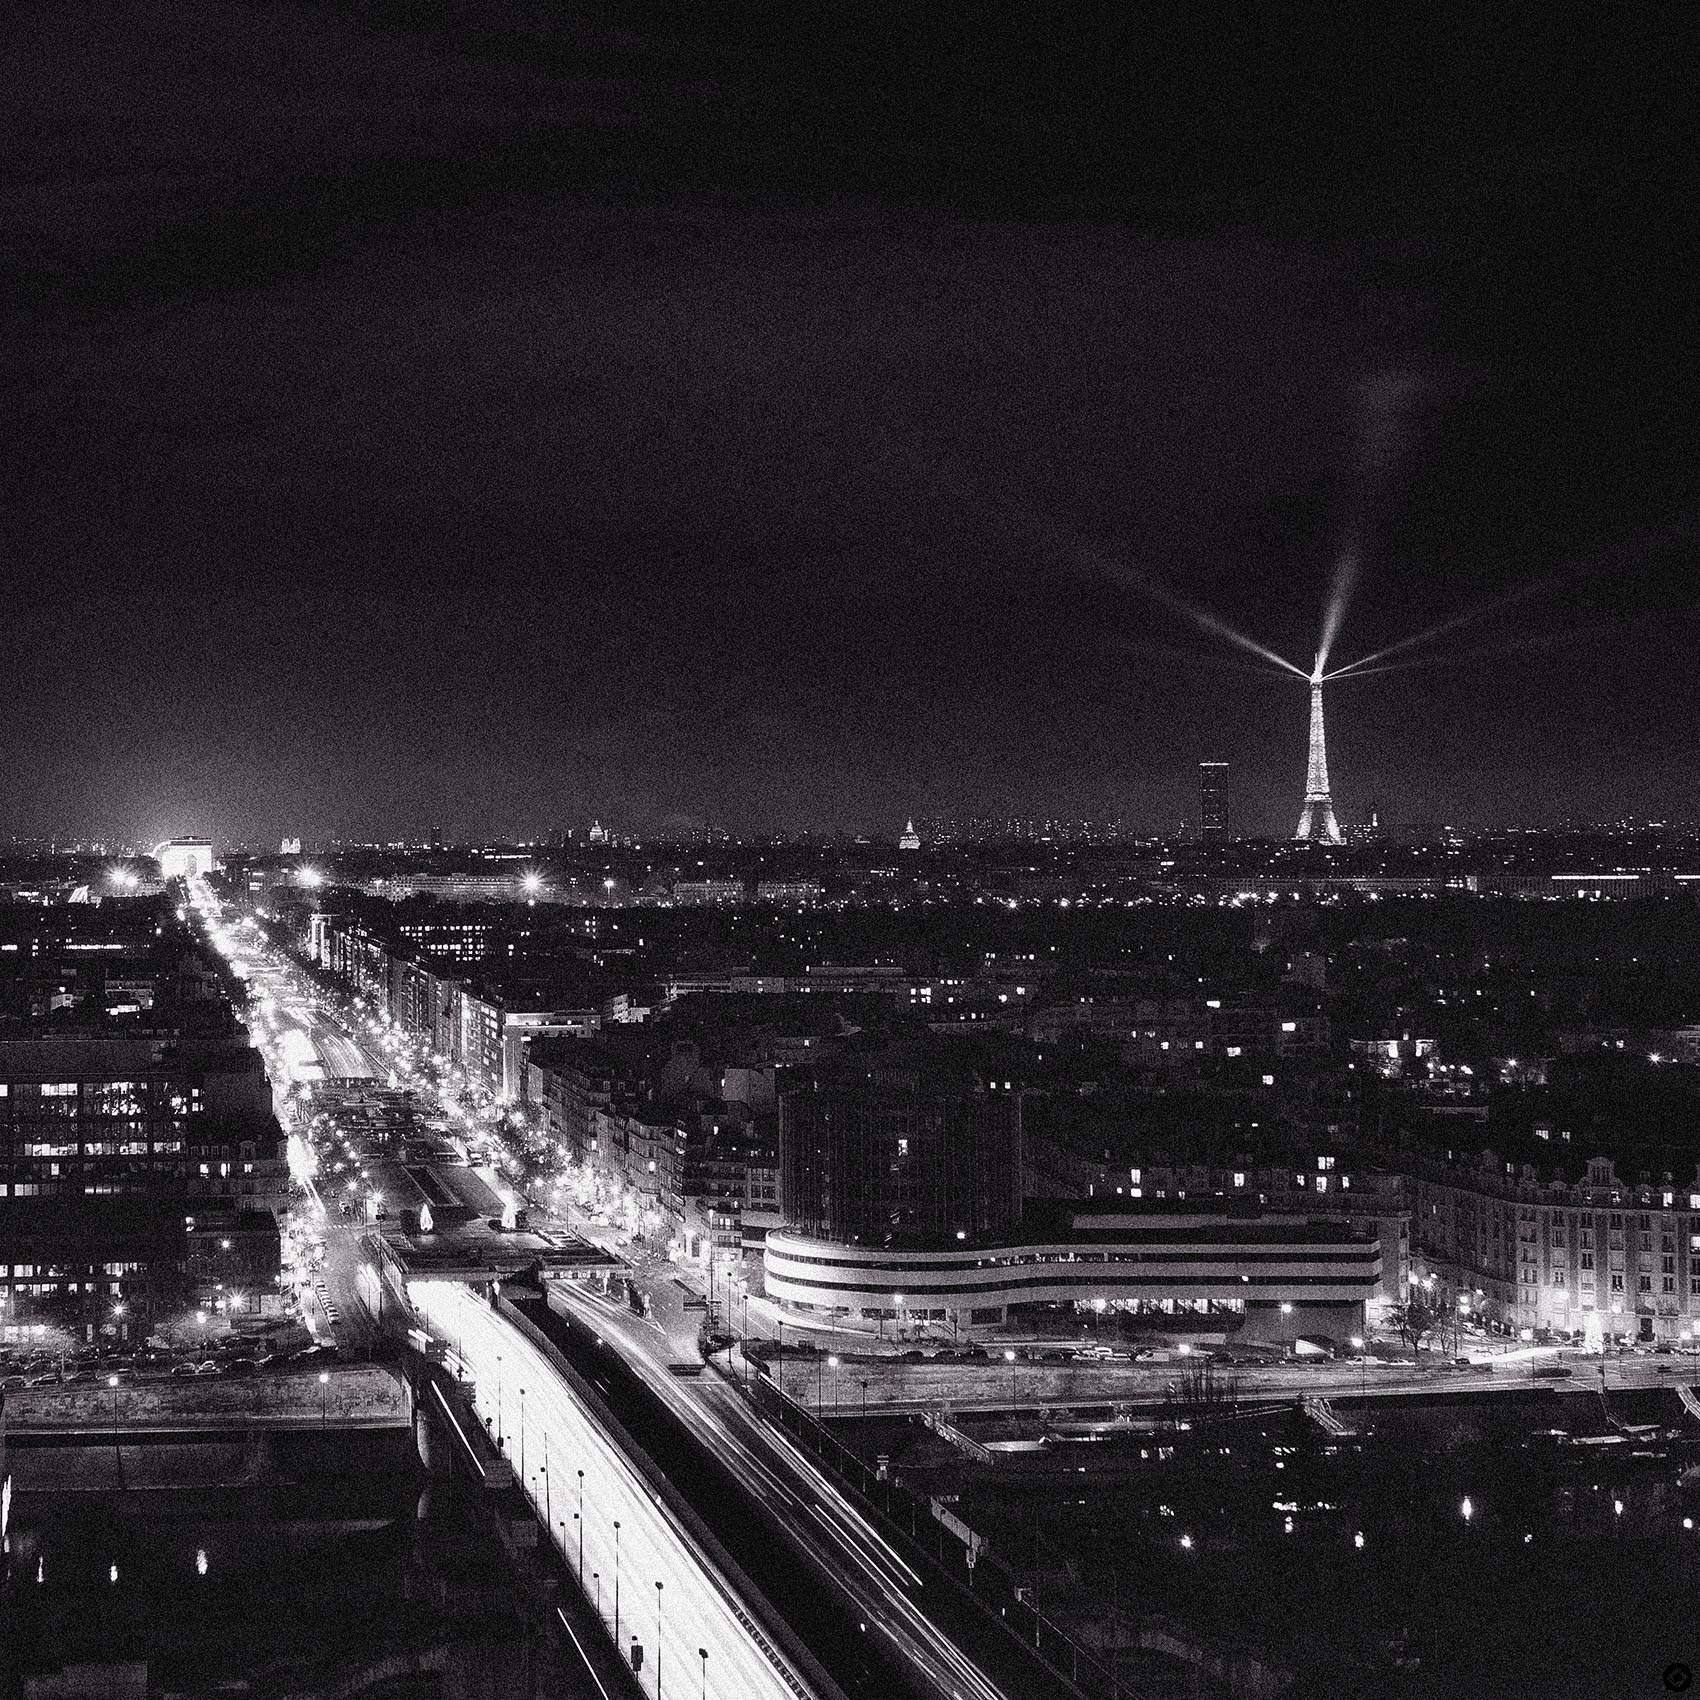 BLOG_MELIA BY NIGHT SKYLINE